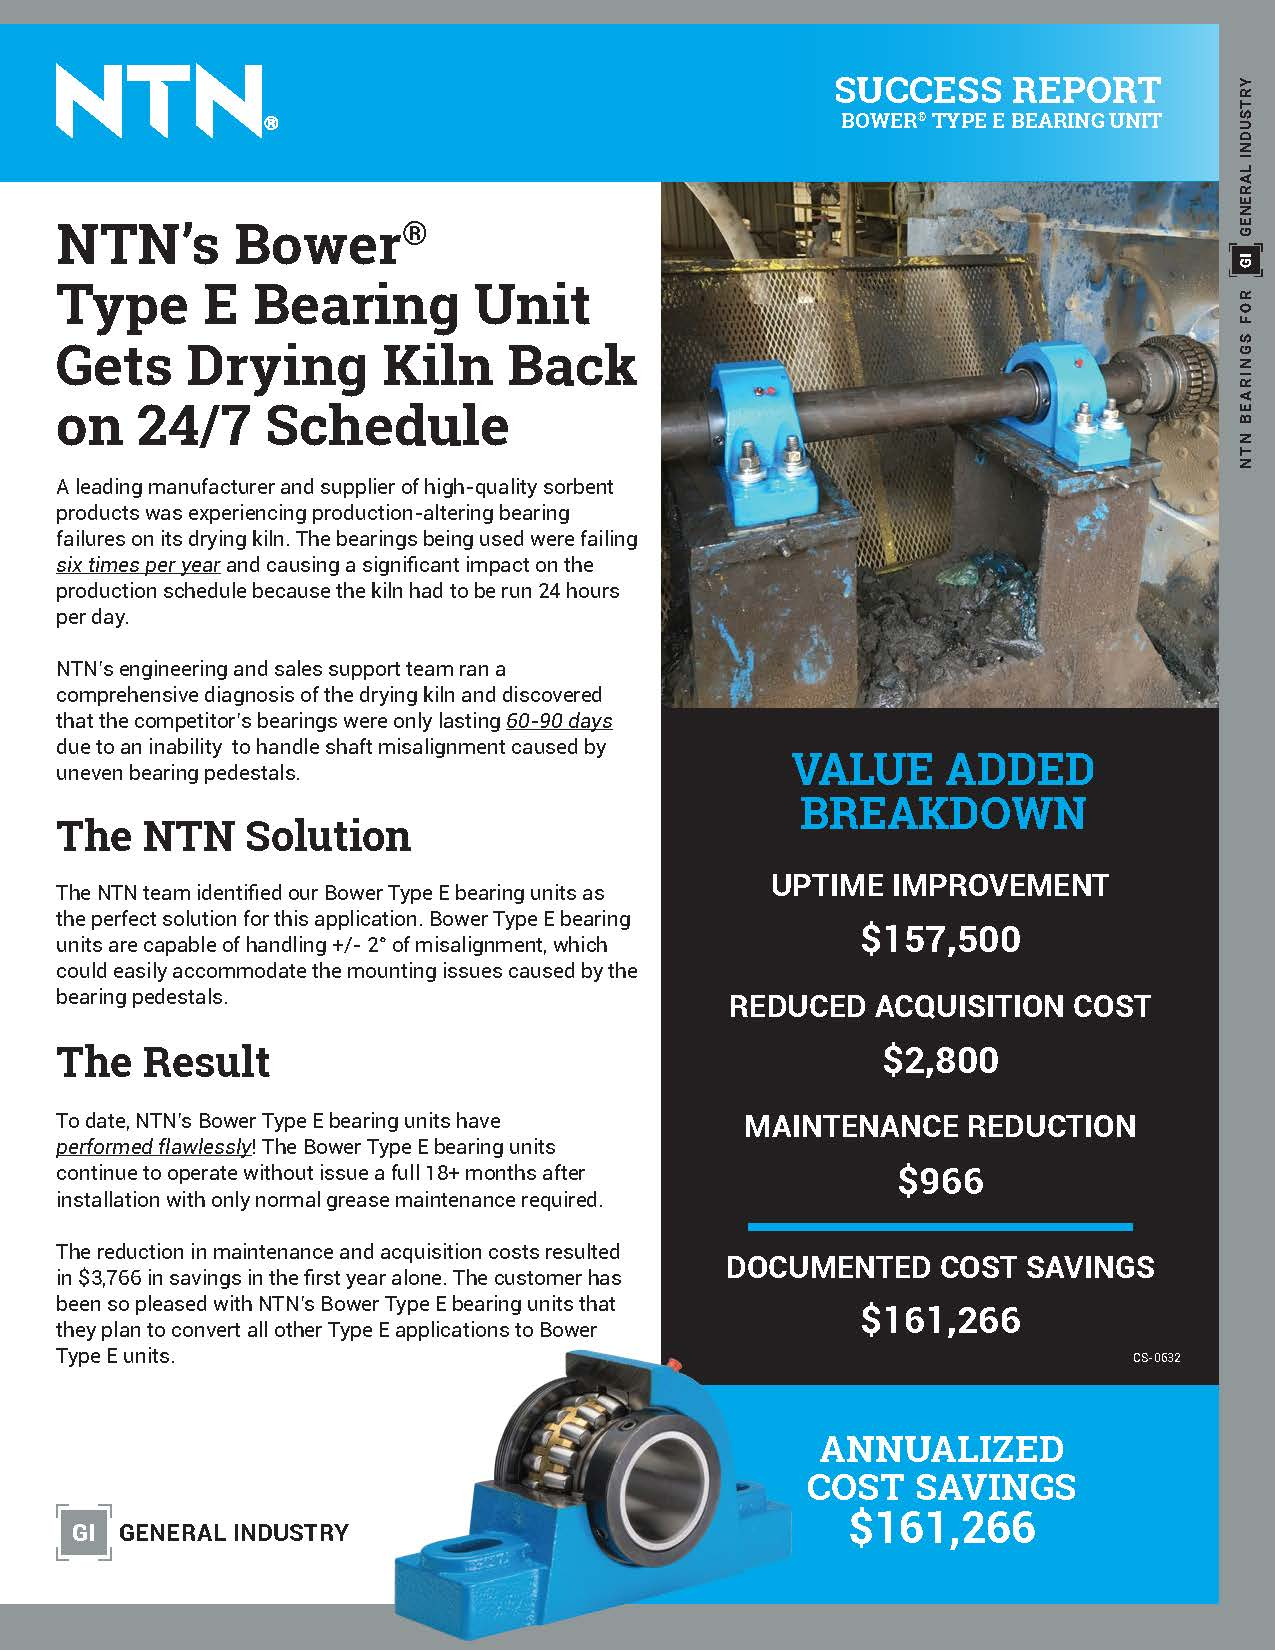 BowerTypeESuccessReporthttps://ntn.ca/wp content/uploads///NTN Bower Type E Success Report.pdf